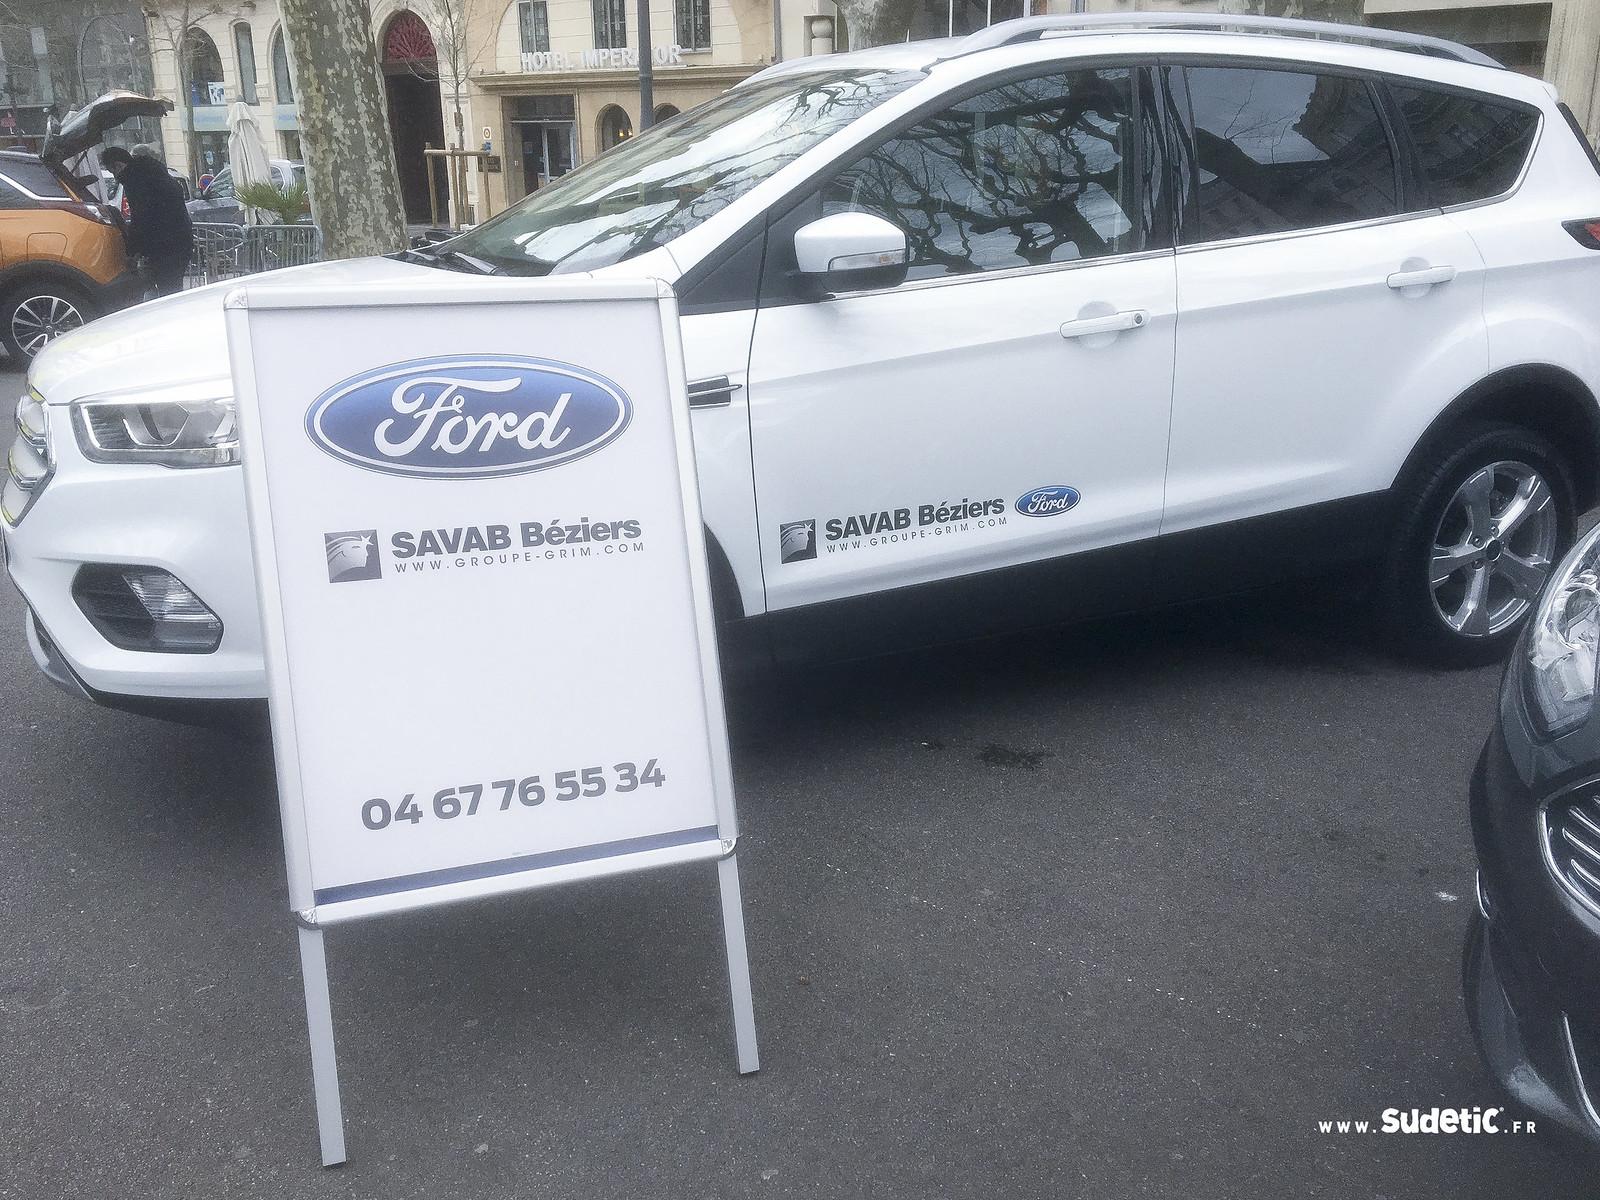 Sudetic chevalet et adhésifs Ford SAVAB-2